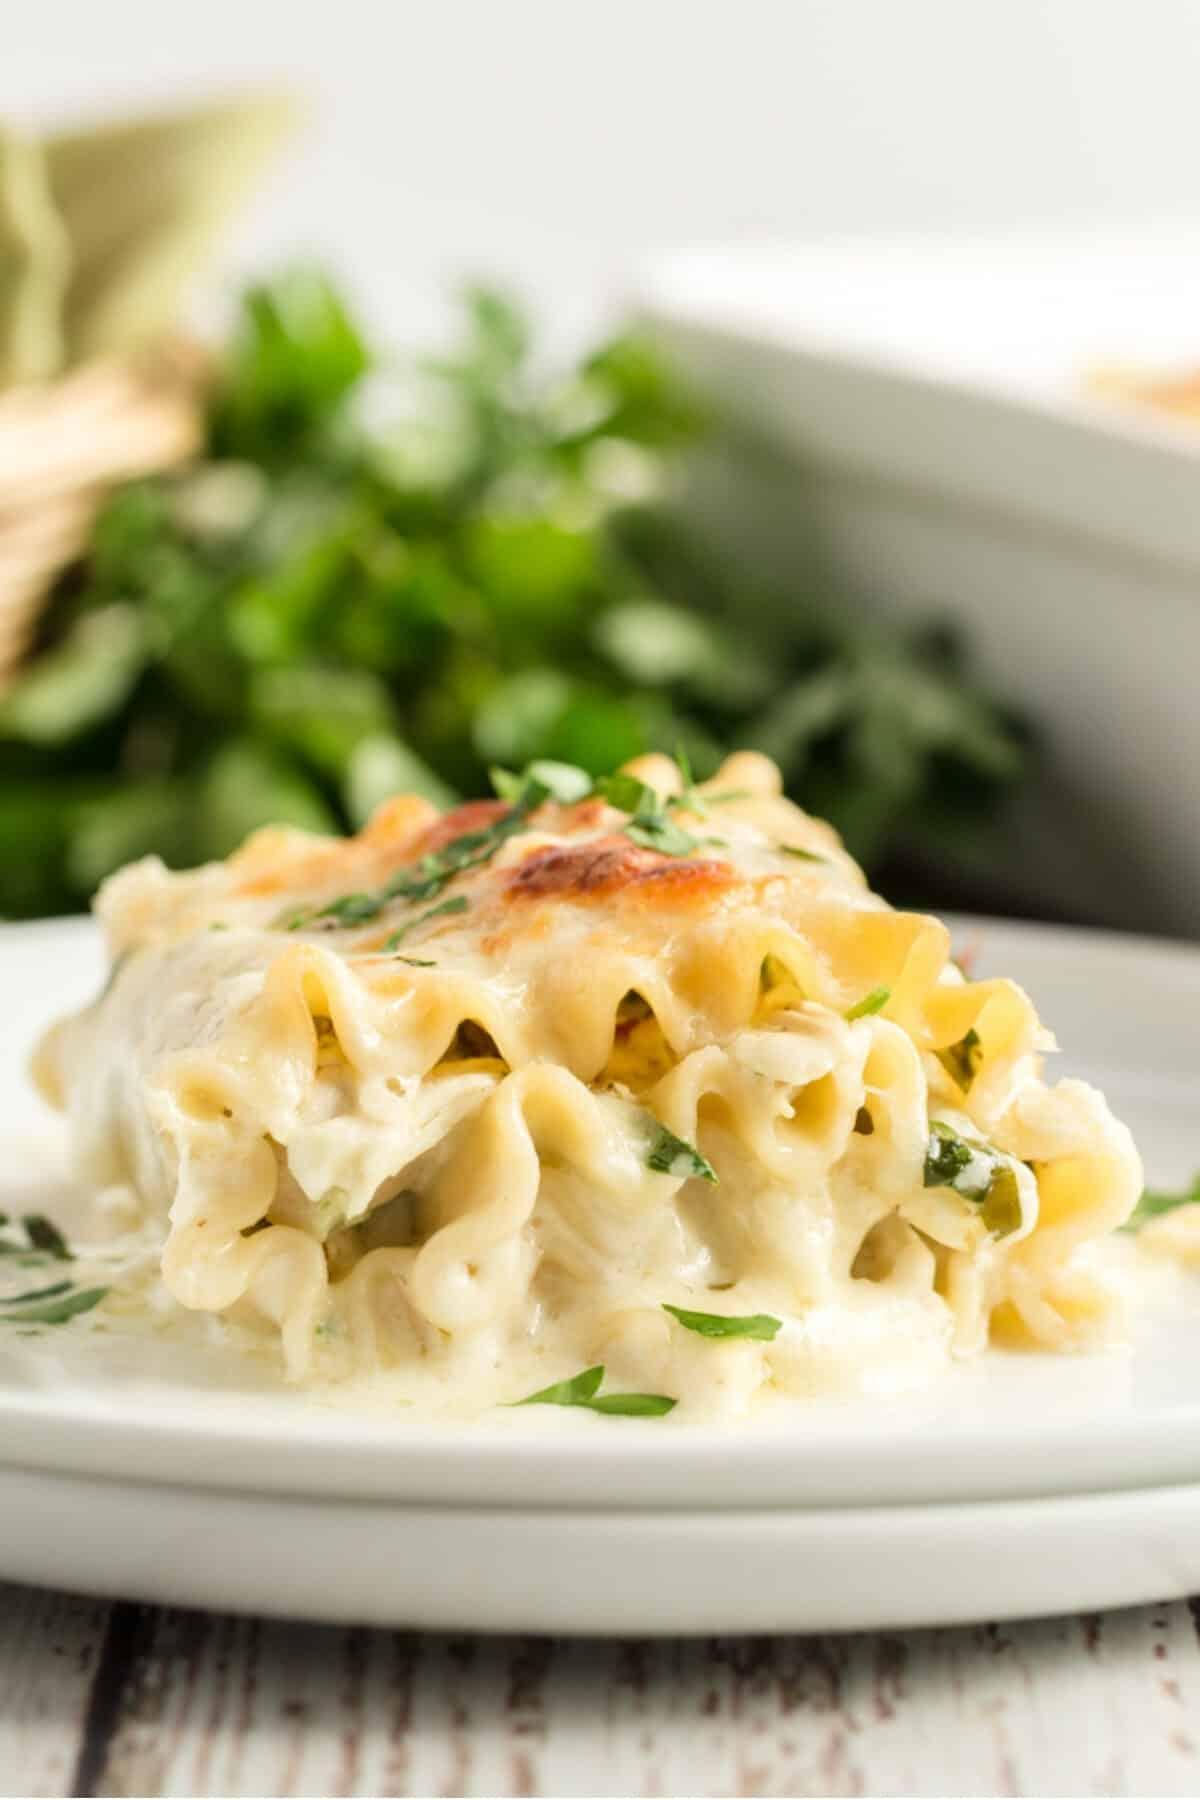 florentine lasagna roll ups on white plates